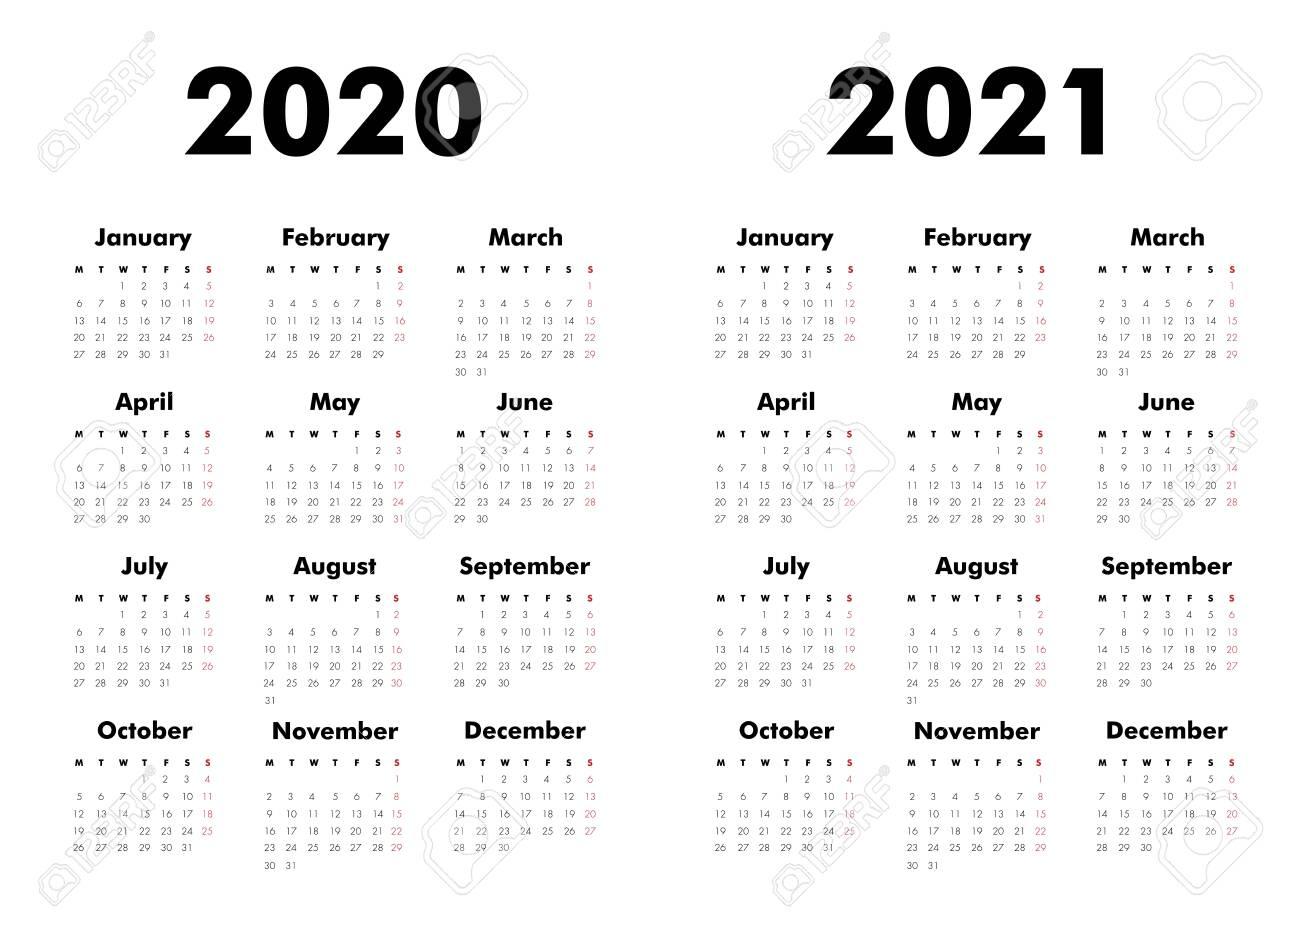 2021 Calendar 2020 Vector Calendar On 2020, 2021 Years. Week Starts Sunday